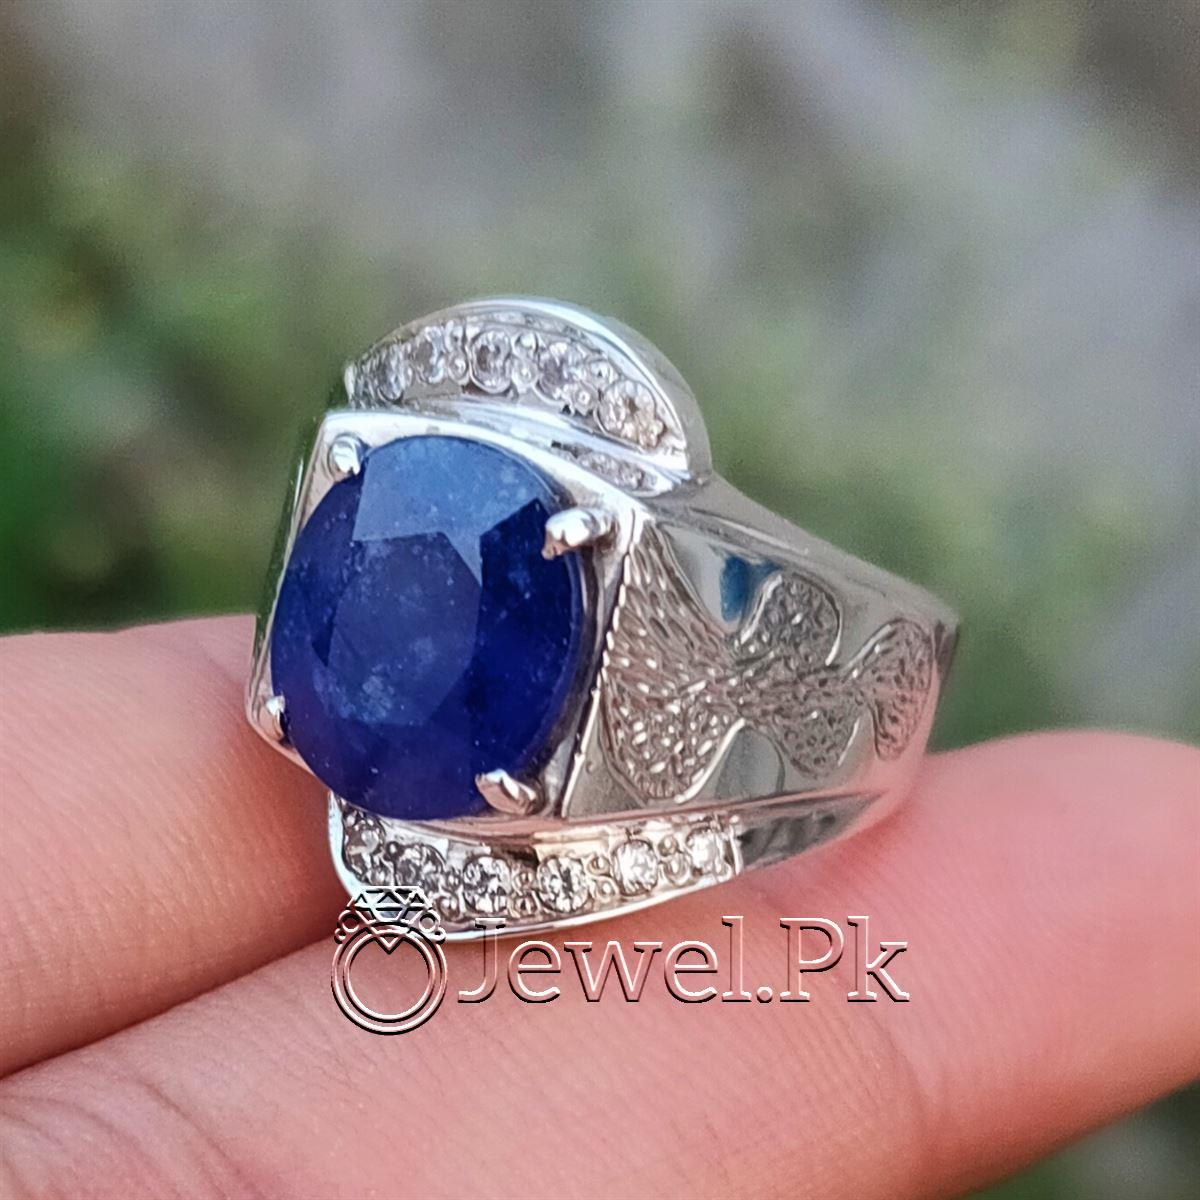 Natural Blue Sapphire Ring 925 Silver Chandi Handmade 3 natural gemstones pakistan + 925 silver jewelry online